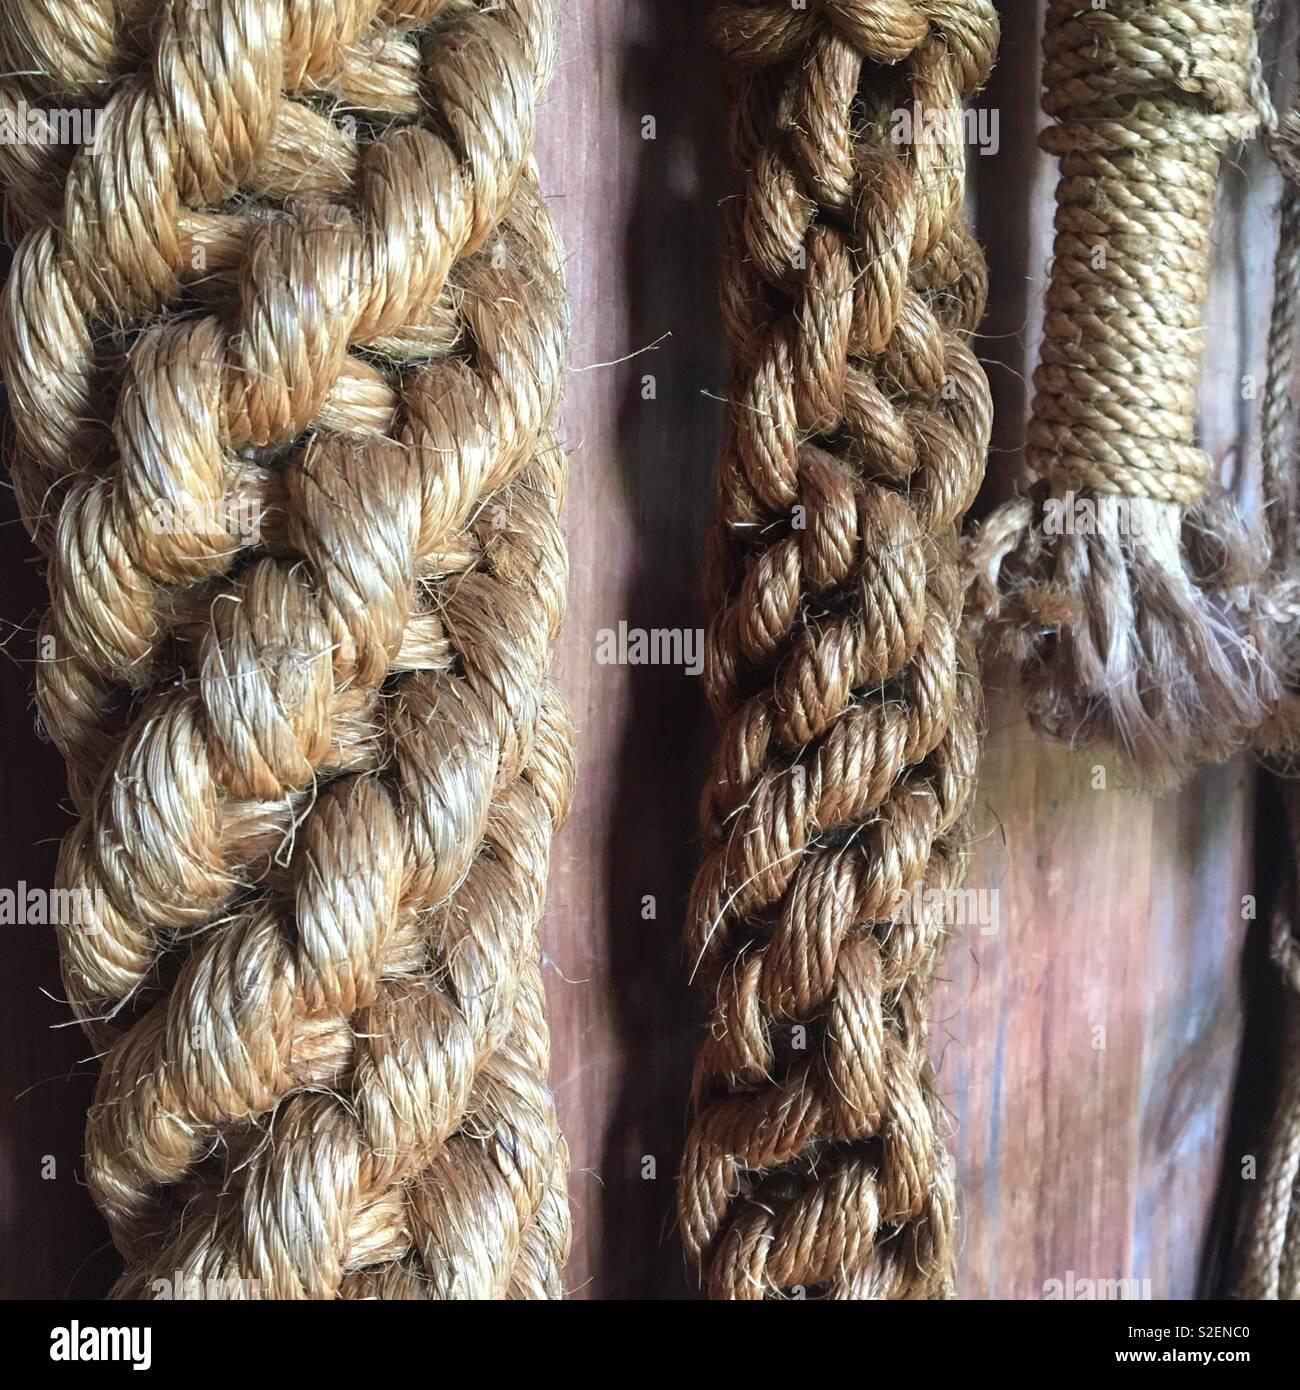 Boating ropes - Stock Image